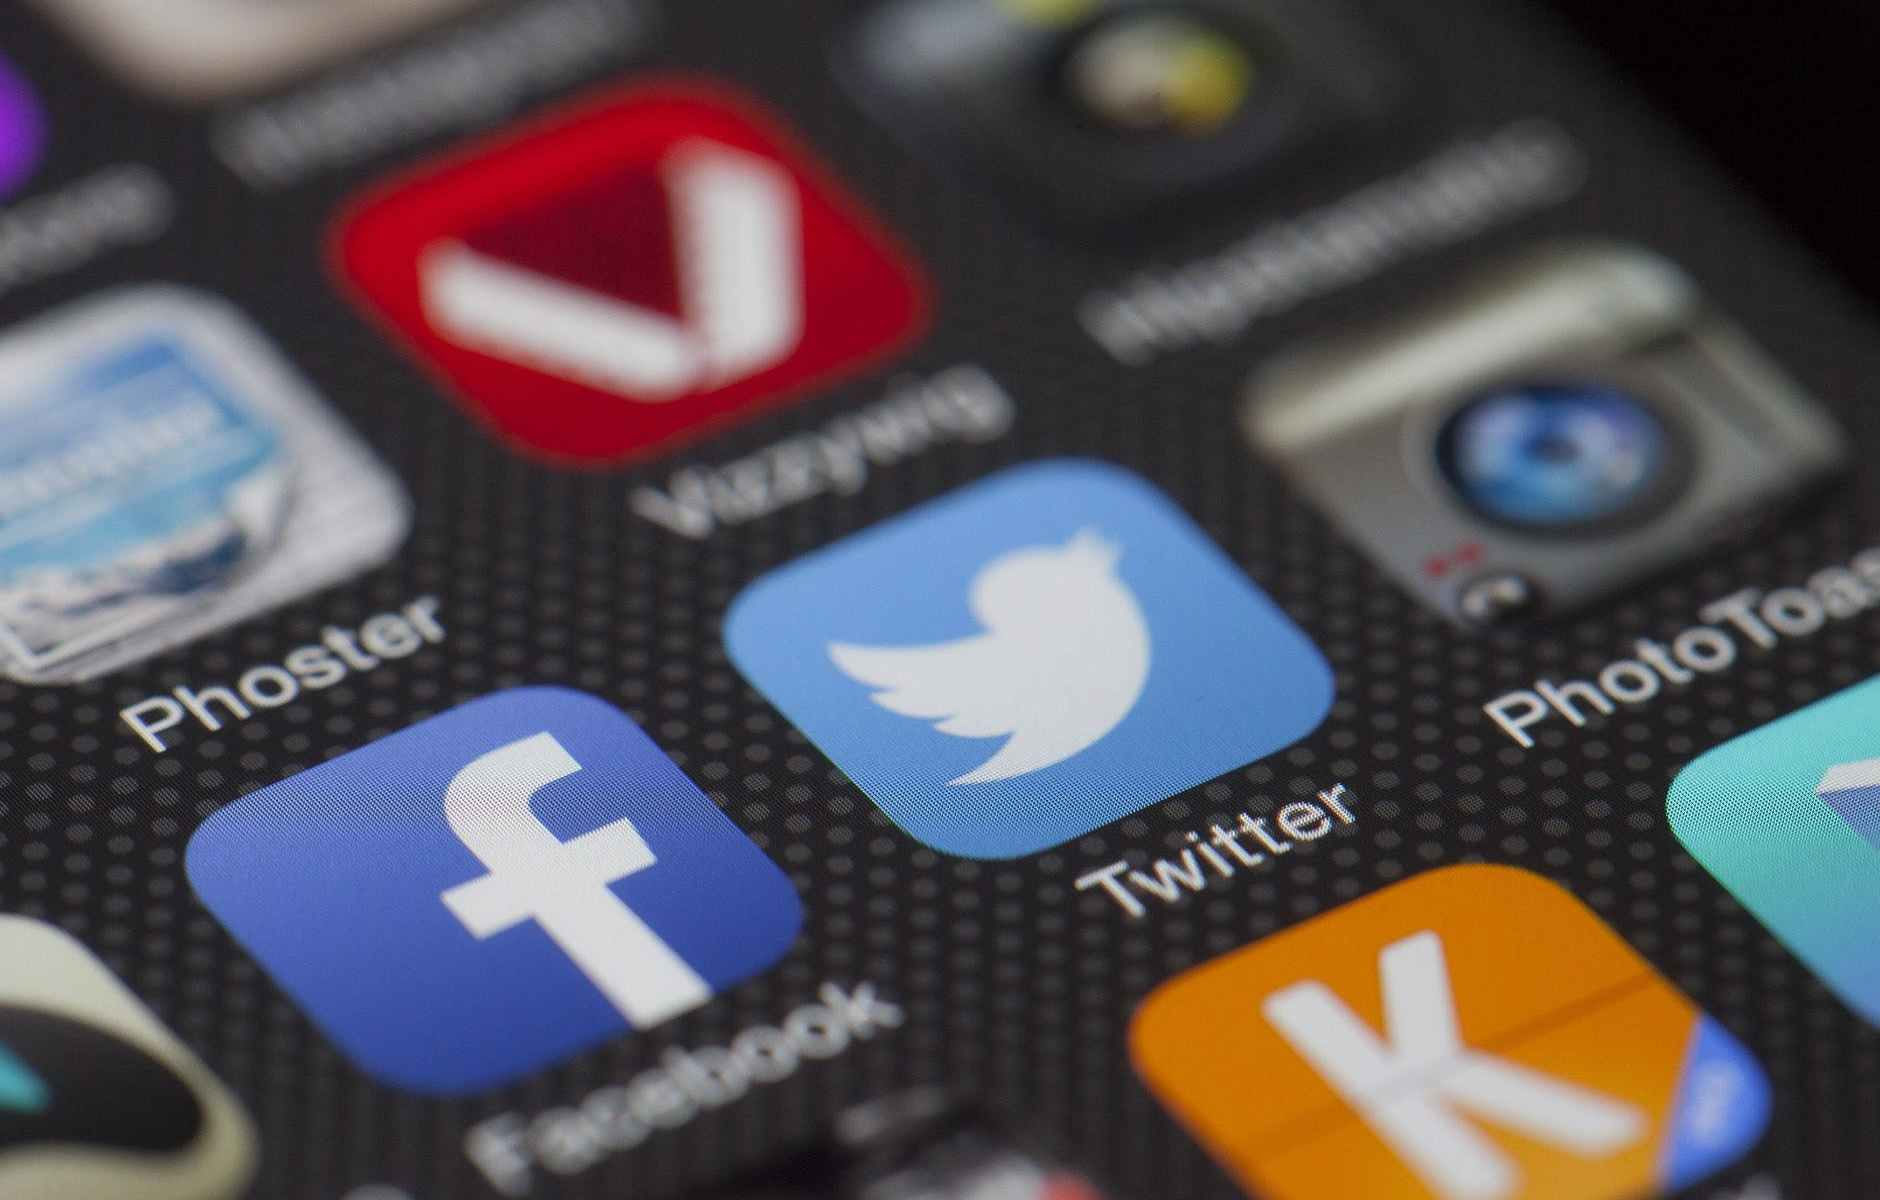 My healing social network